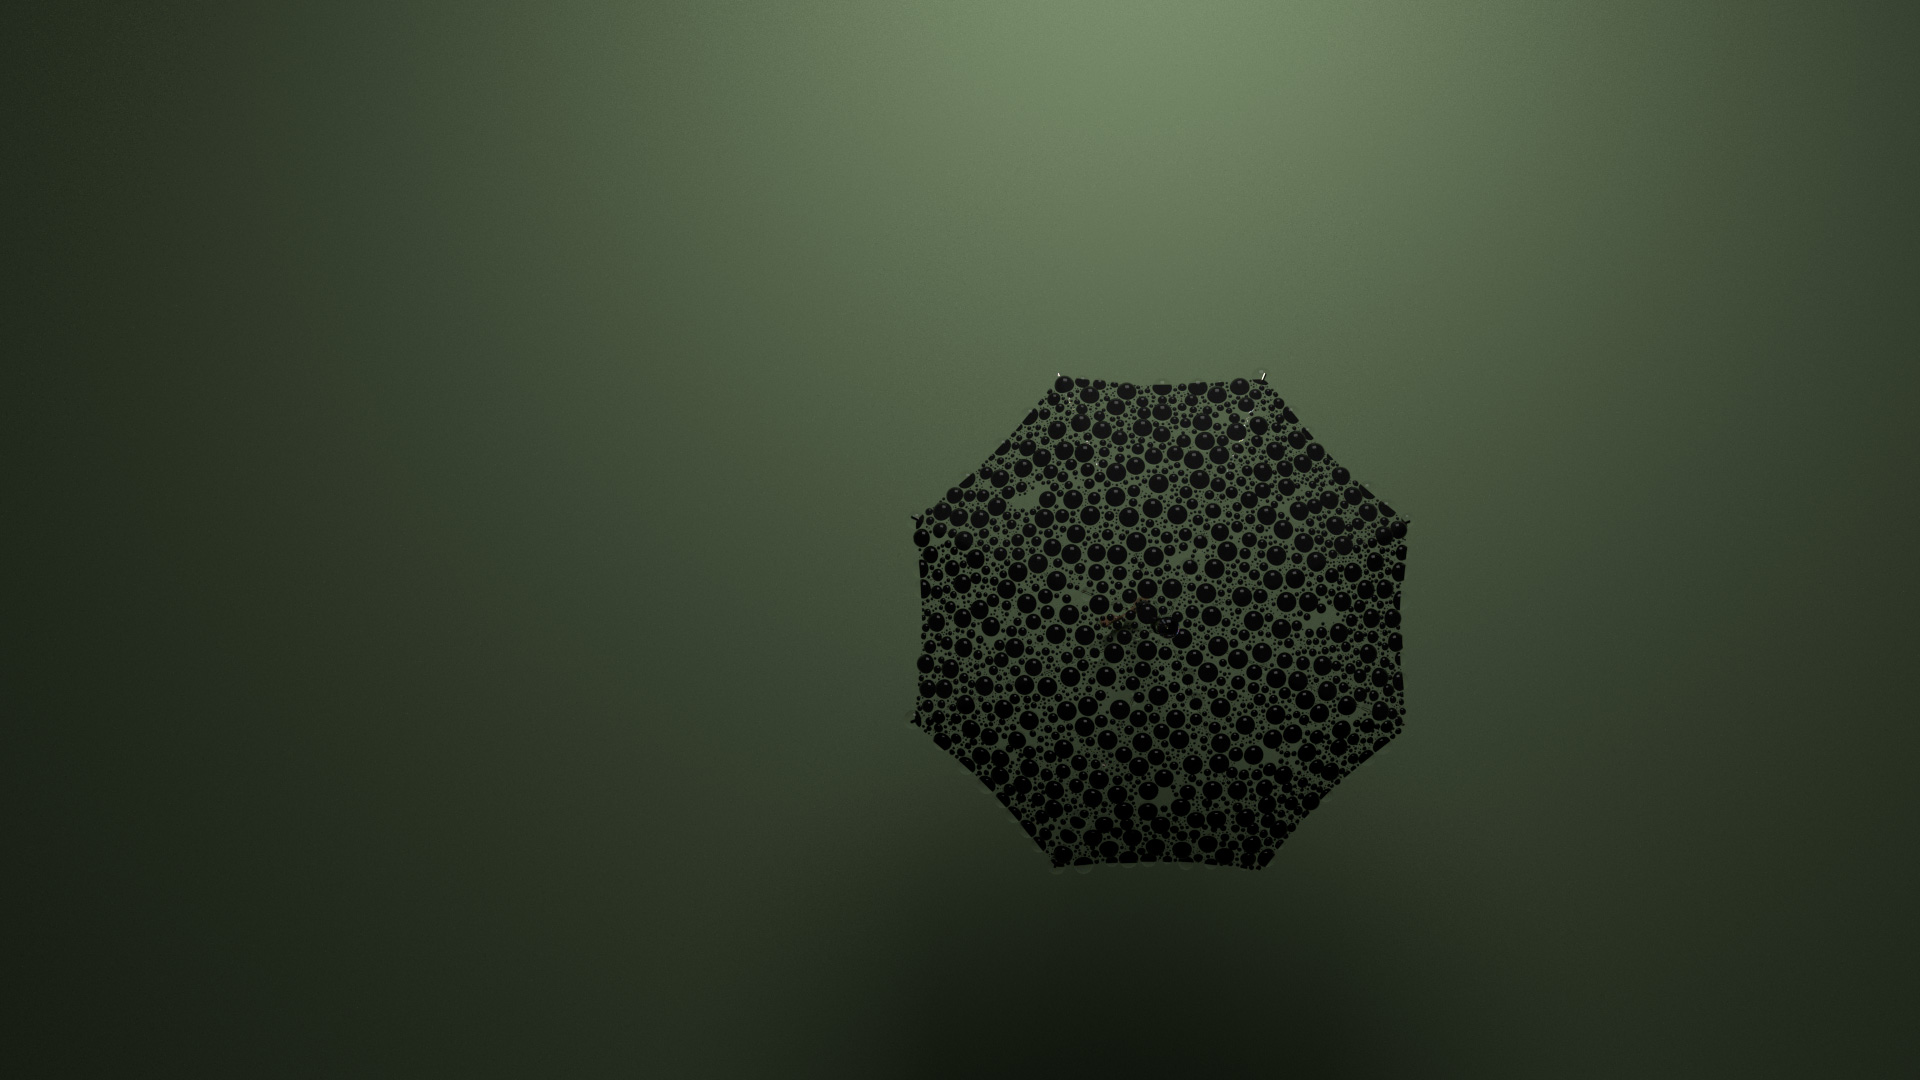 JBrocklebank_Drops_014.jpg